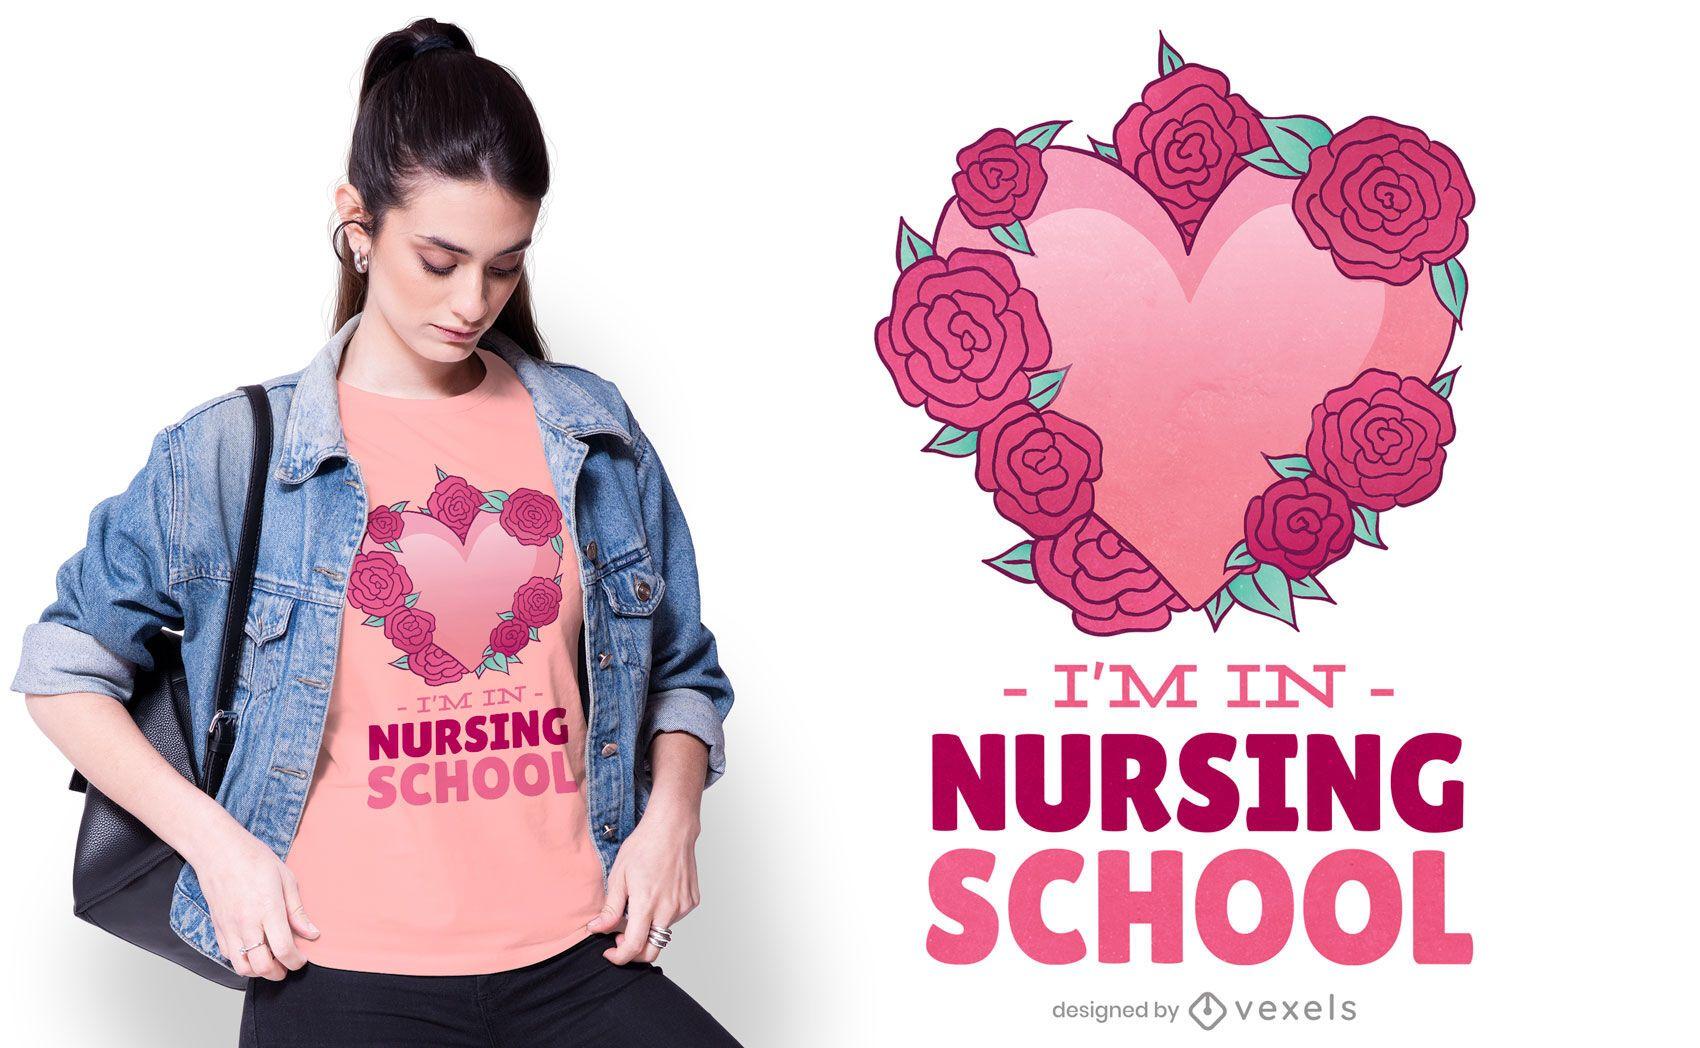 Nursing school t-shirt design